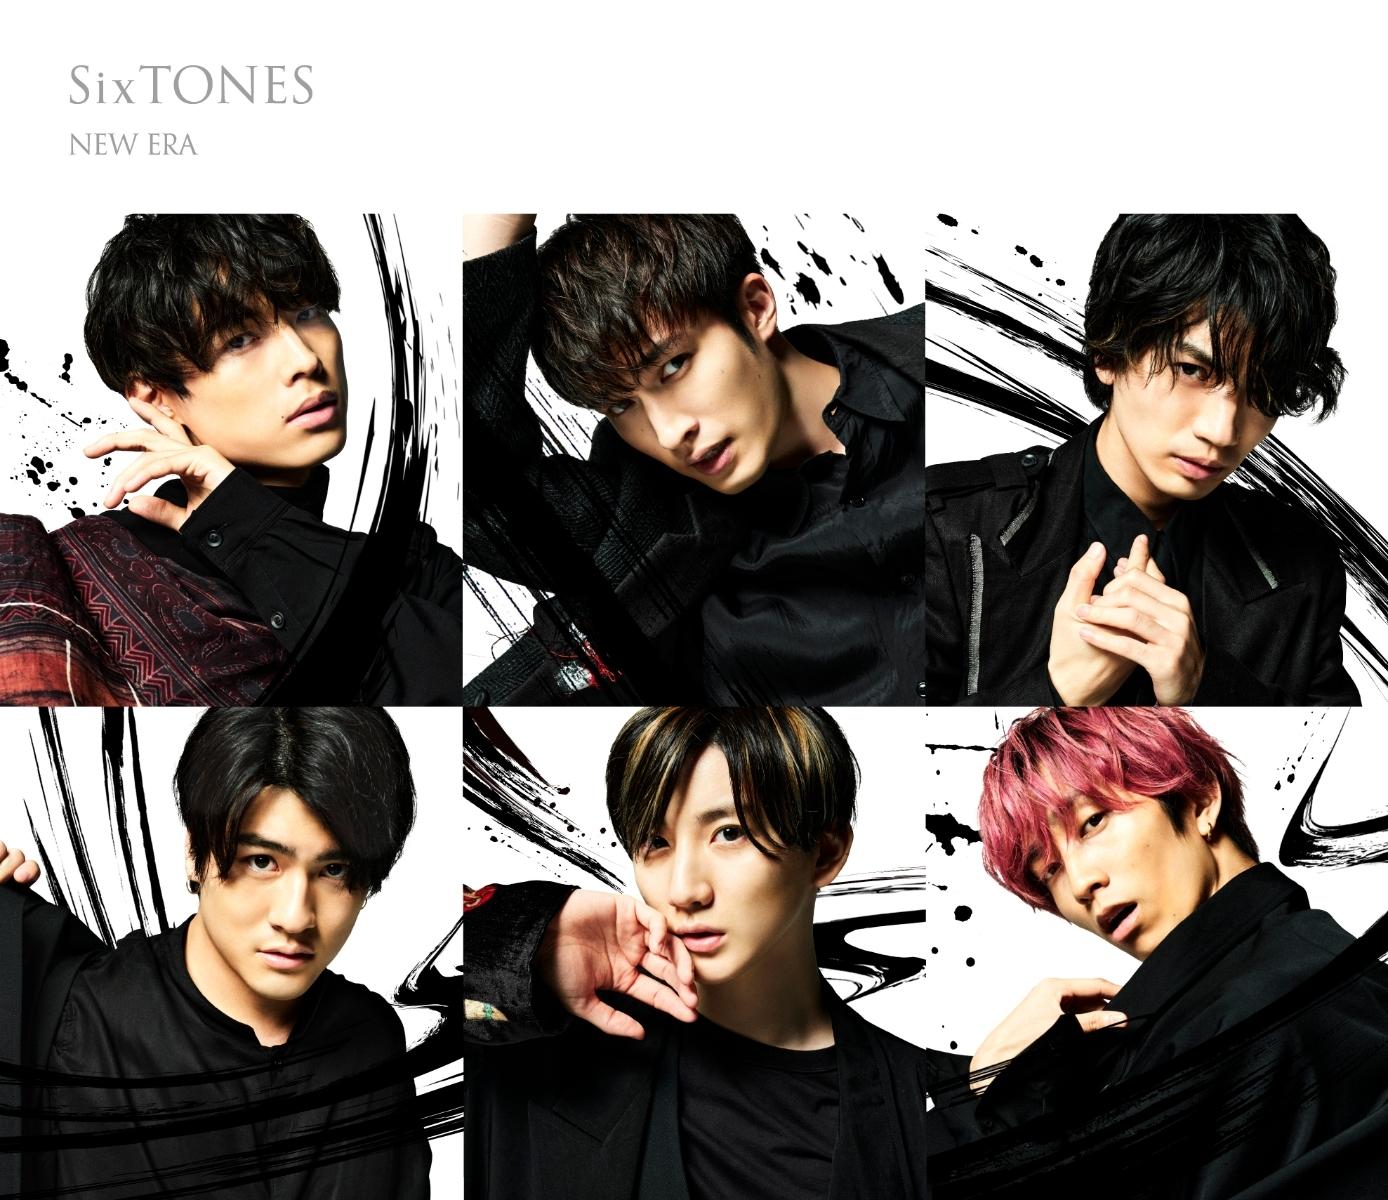 SixTONES (ストーンズ) 3rdシングル『NEW ERA』(2020年11月11日発売) 高画質CDジャケット画像 (ジャケ写)